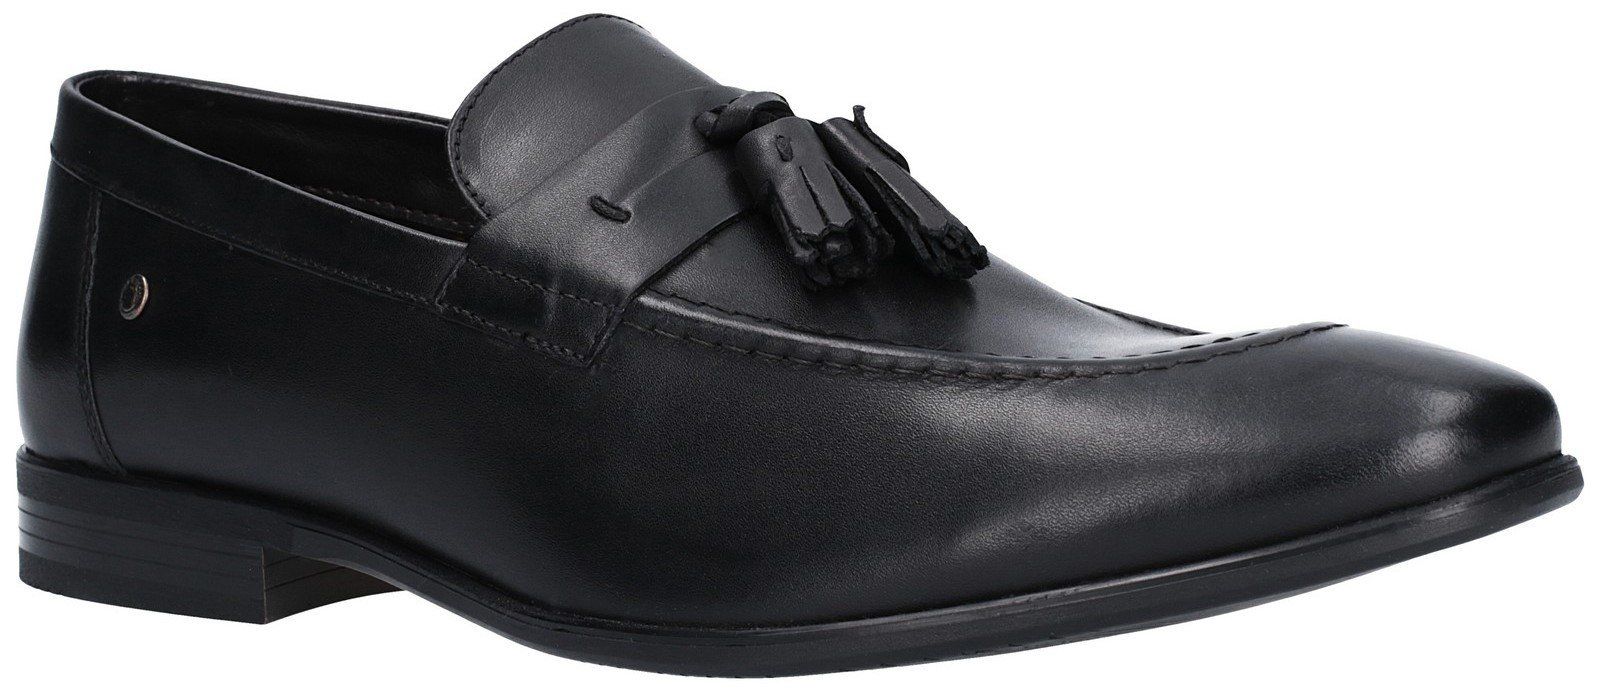 Base London Men's Ritz Waxy Loafer Black 27262 - BLACK 6